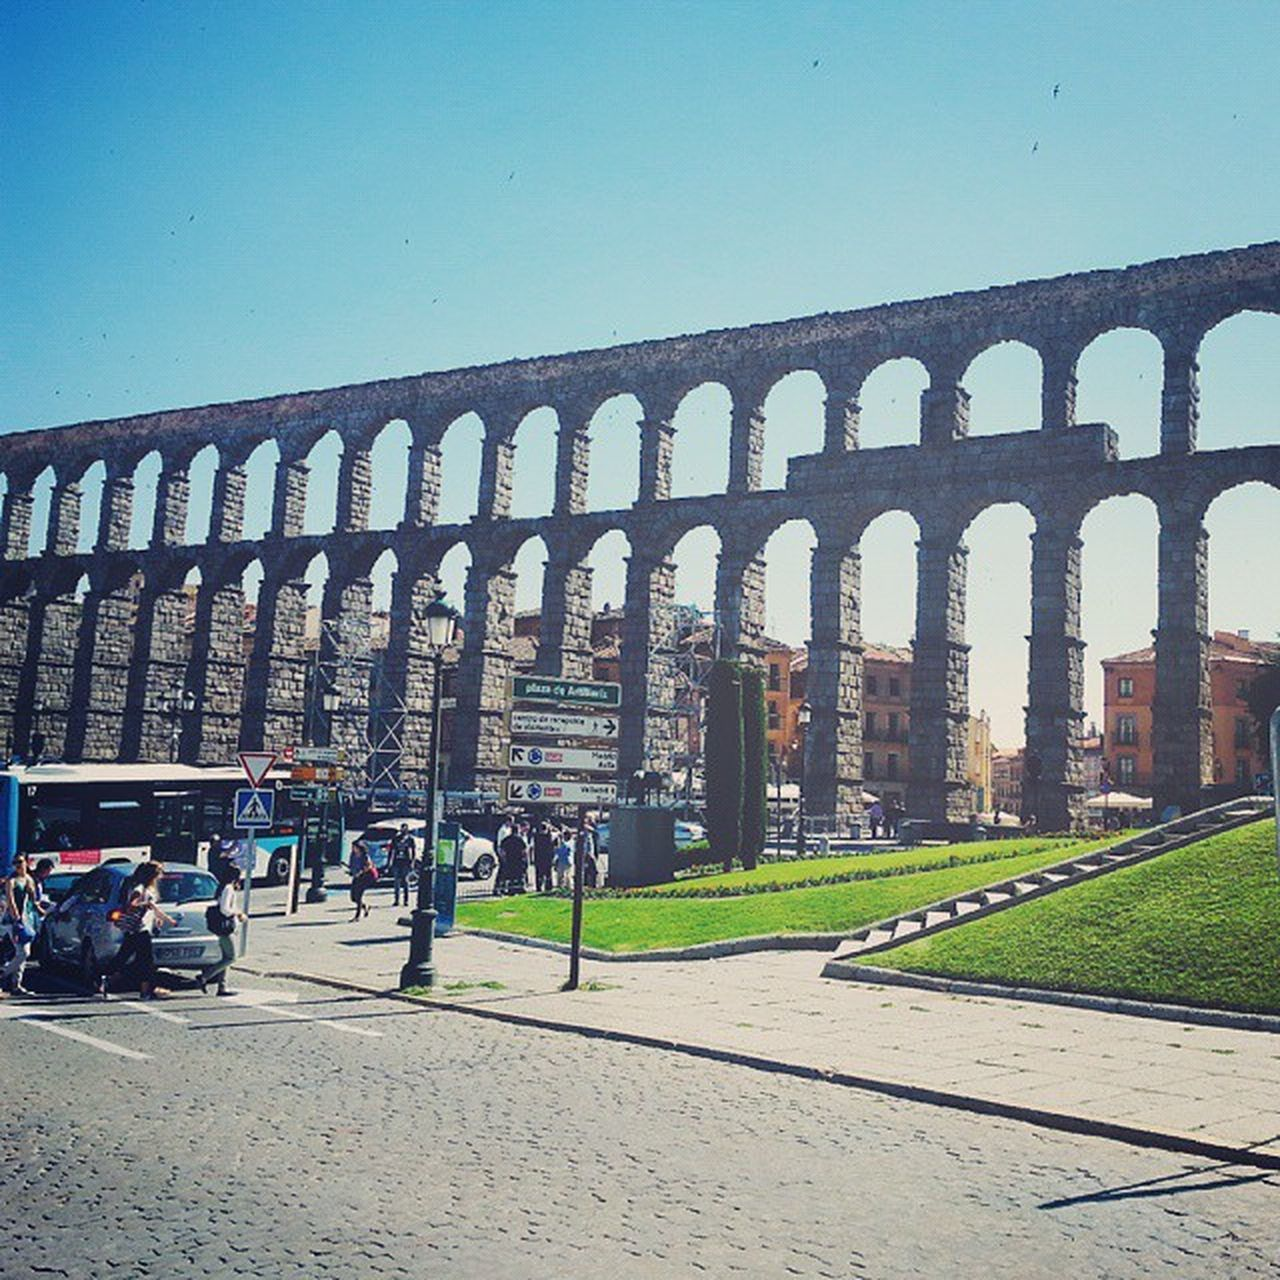 Such a beautiful place 💙 Vscocam Vscospain Segovia City Beauty Roman Style Town Tourist Sky Medieval Small Cozy SPAIN Goingtoieu Iexp15 Ie Ieuniversity Happiness Stroll Journey Walk